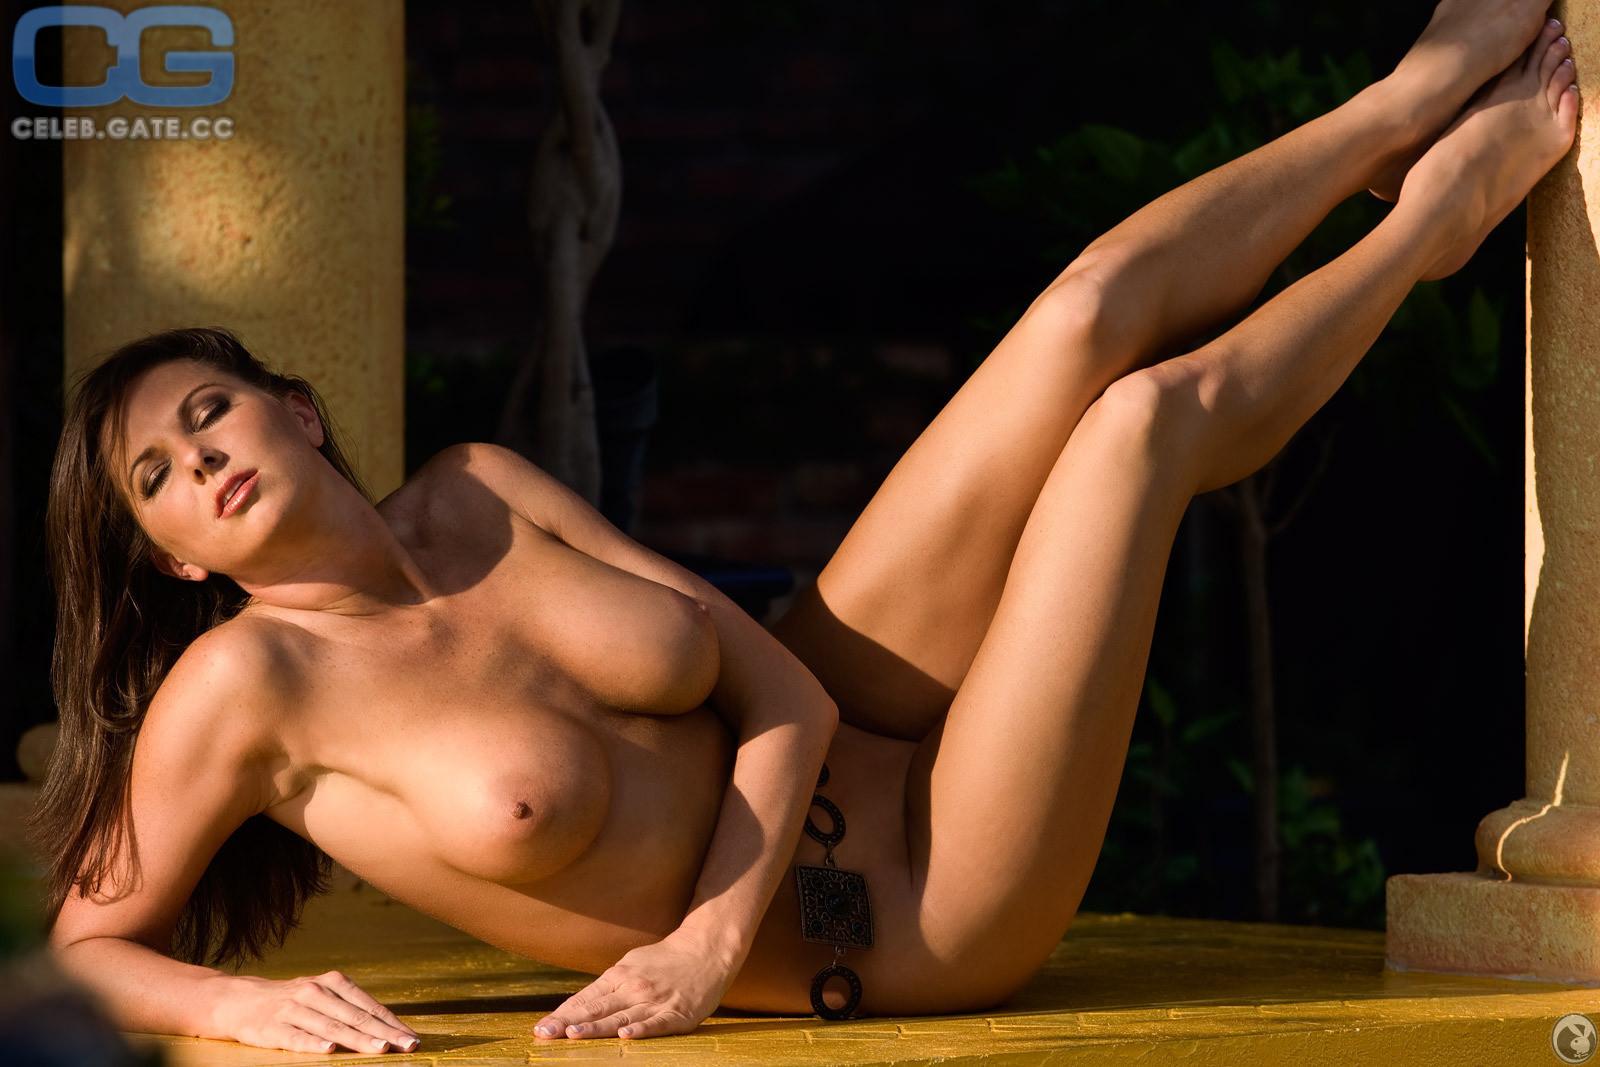 Suzanne berkshire nude teaser